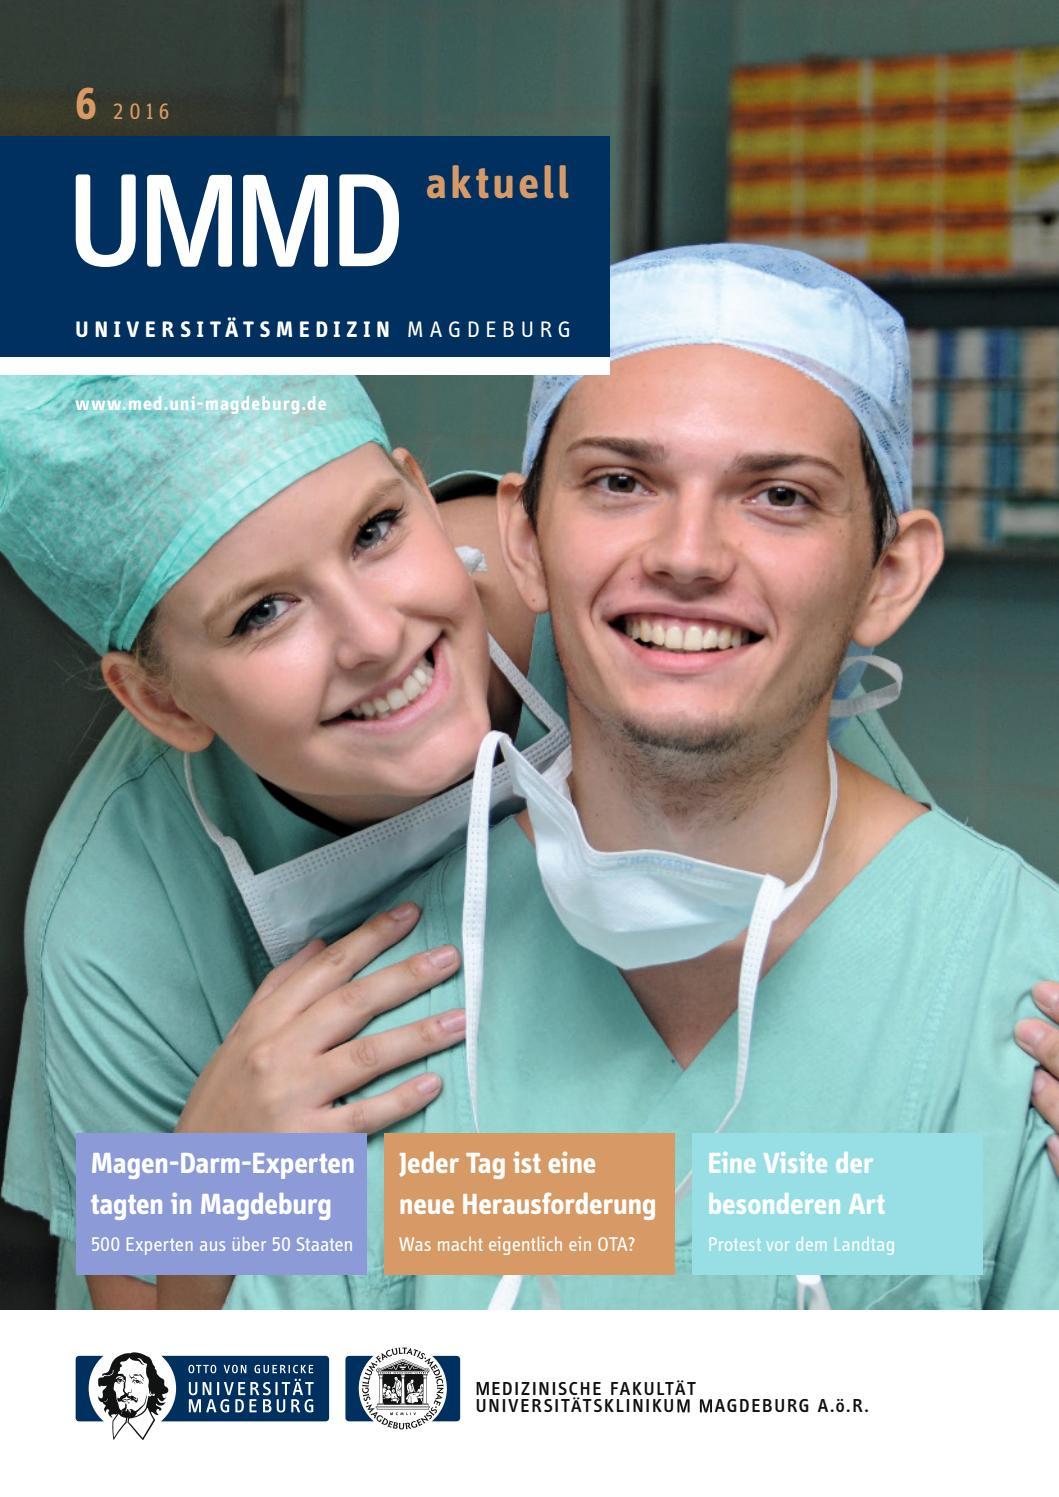 147034 uni ummd aktuell 06 2016 int by Universitätsmedizin Magdeburg - issuu